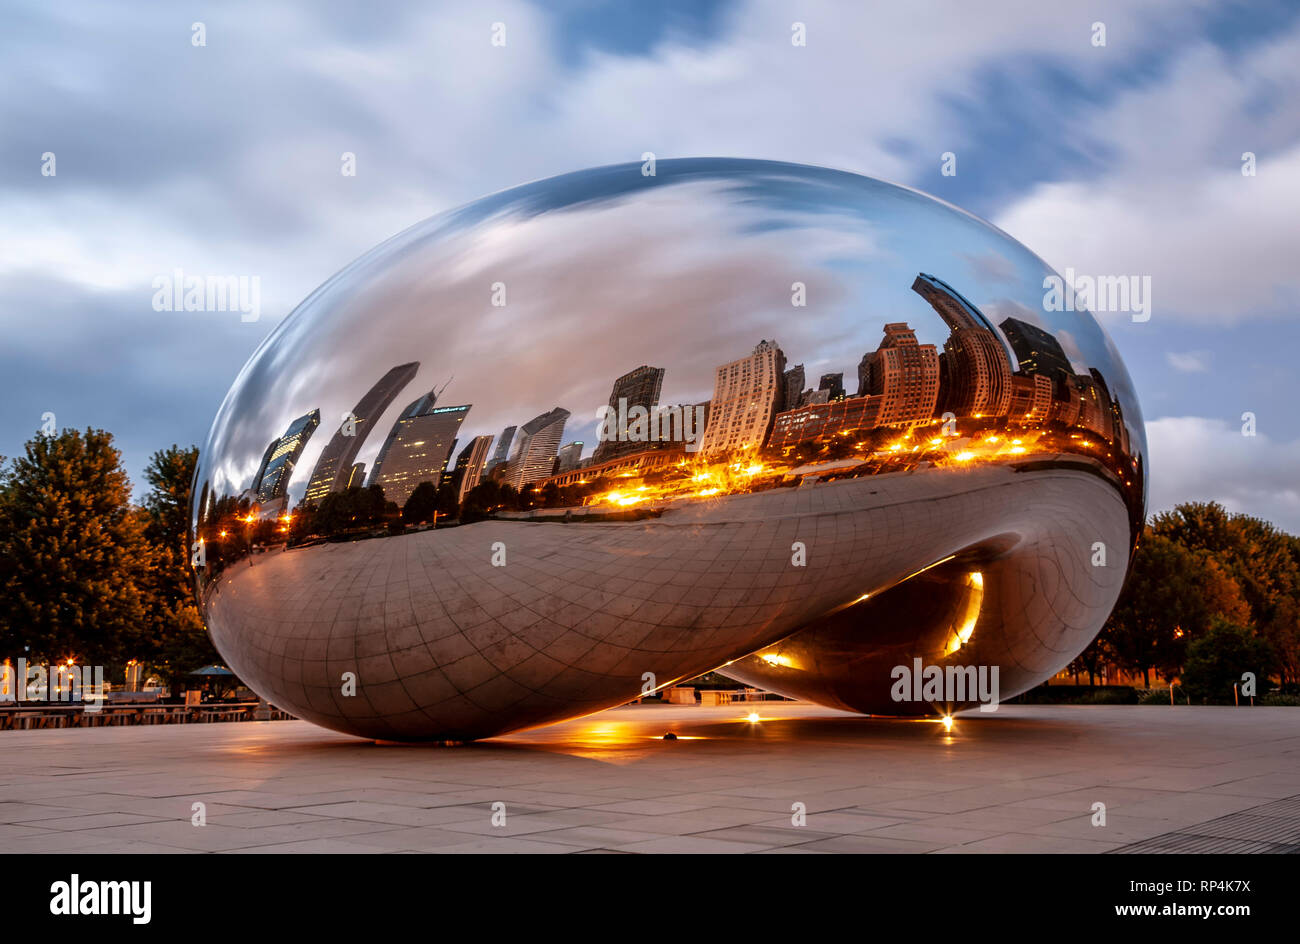 The Cloud (by Anish Kapoor), aka The Bean, Millennium Park, Chicago, Illinois USA - Stock Image